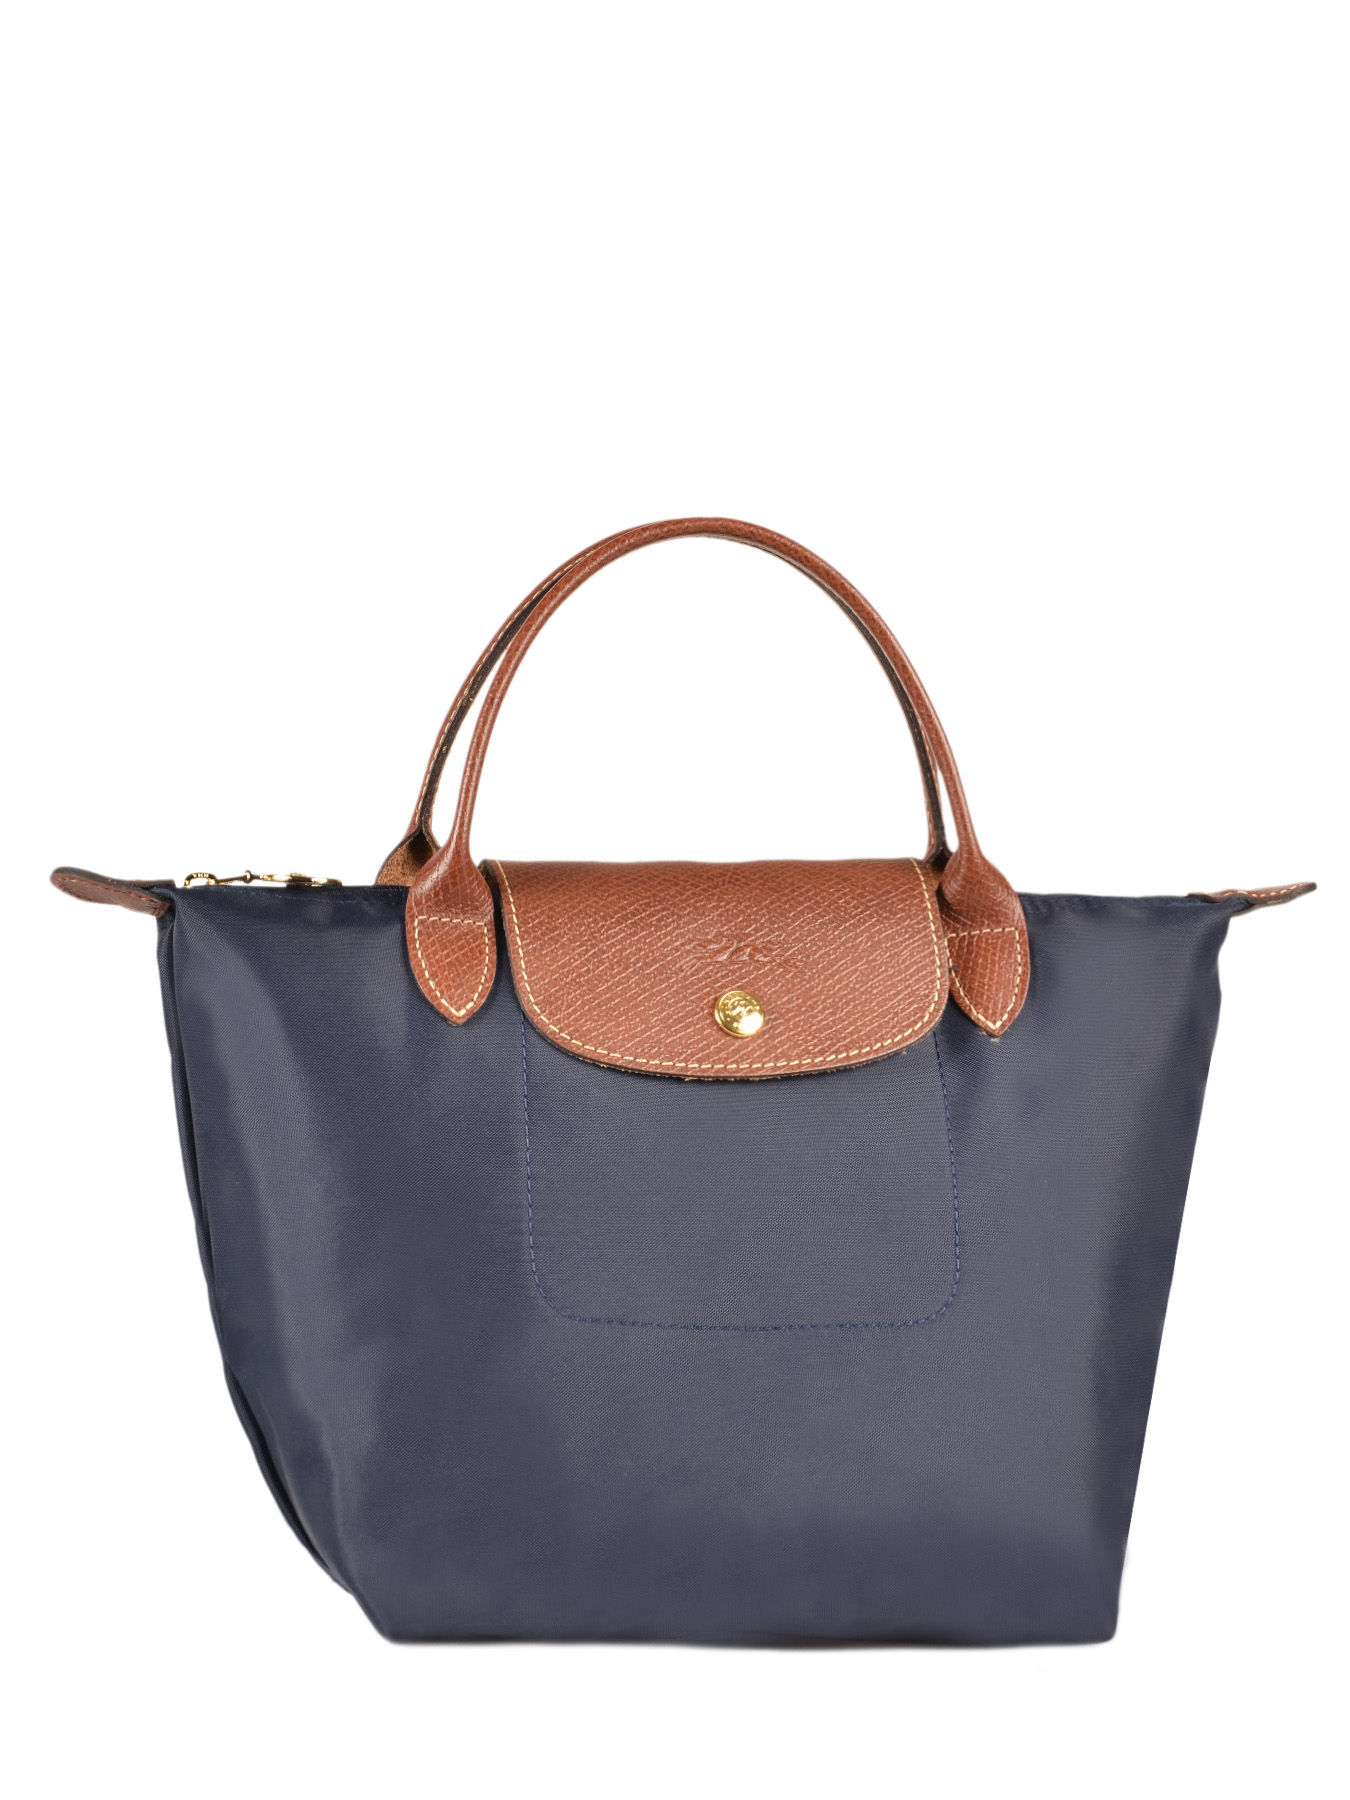 3eb95a71021 Petit sac shopping Le Pliage Longchamp Taille S sur Edisac.com